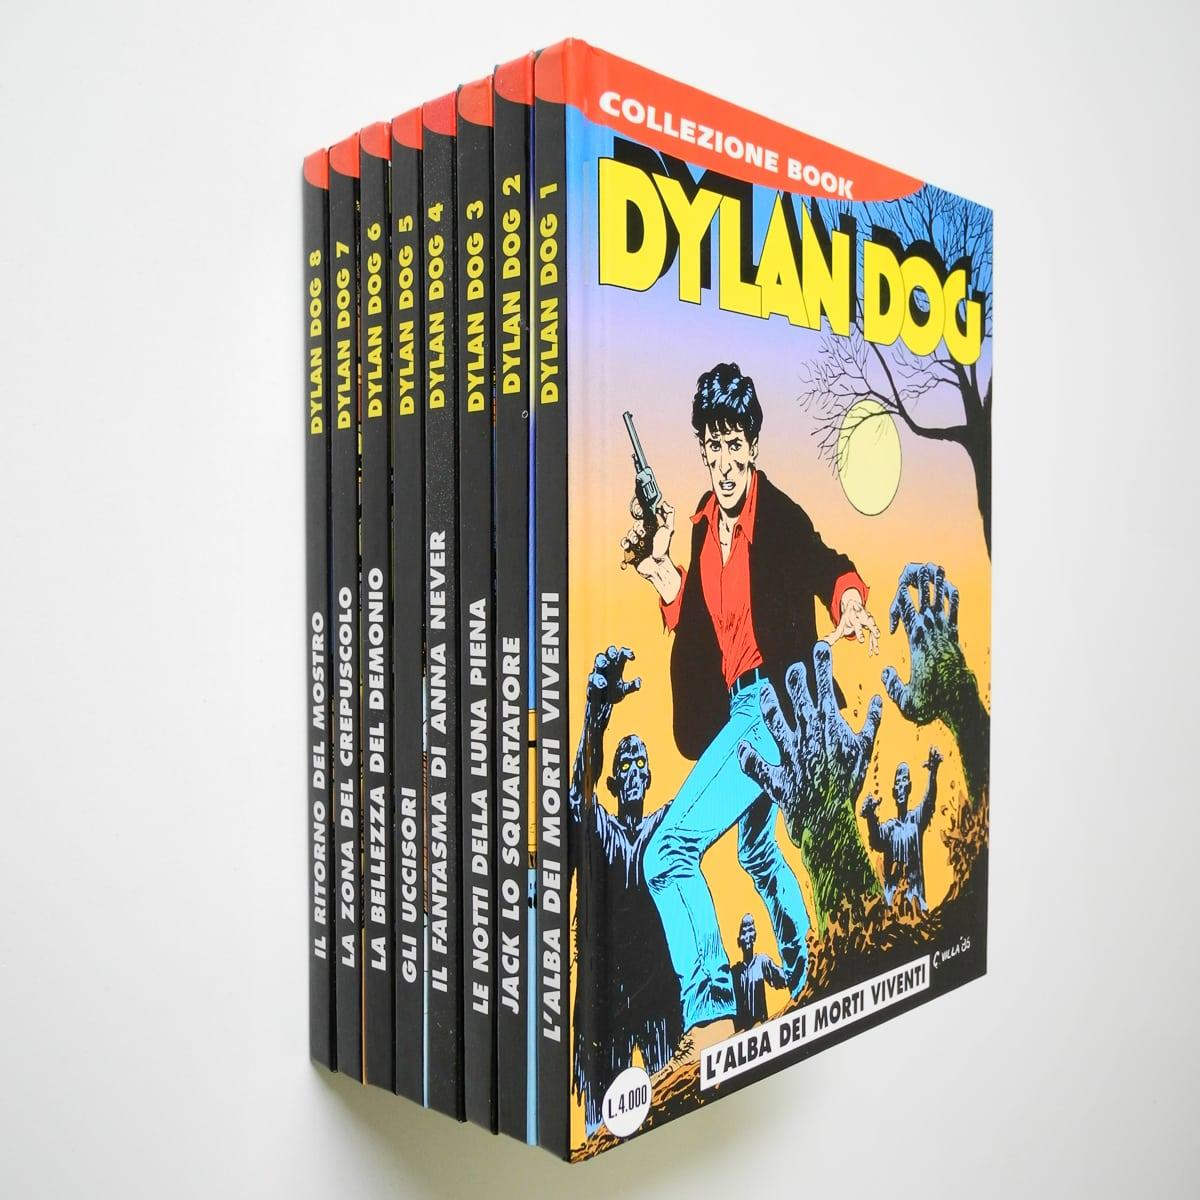 Dylan Dog Collezione Book sequenza completa n. 1/8 Bonelli